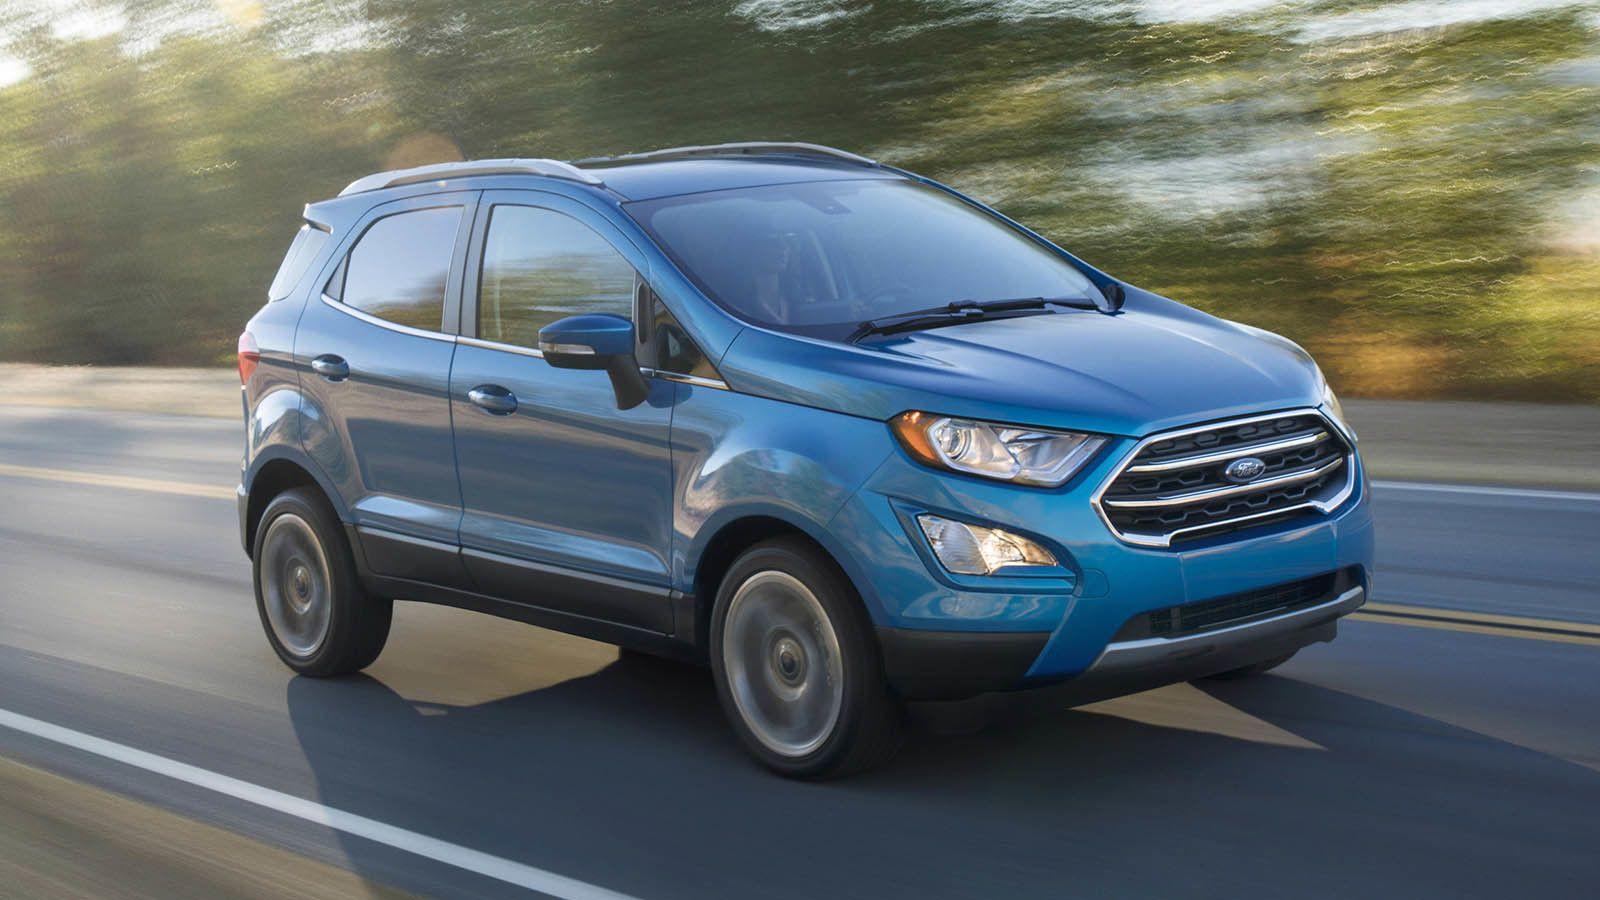 2017 Ford EcoSport Ford ecosport, suv, Suv